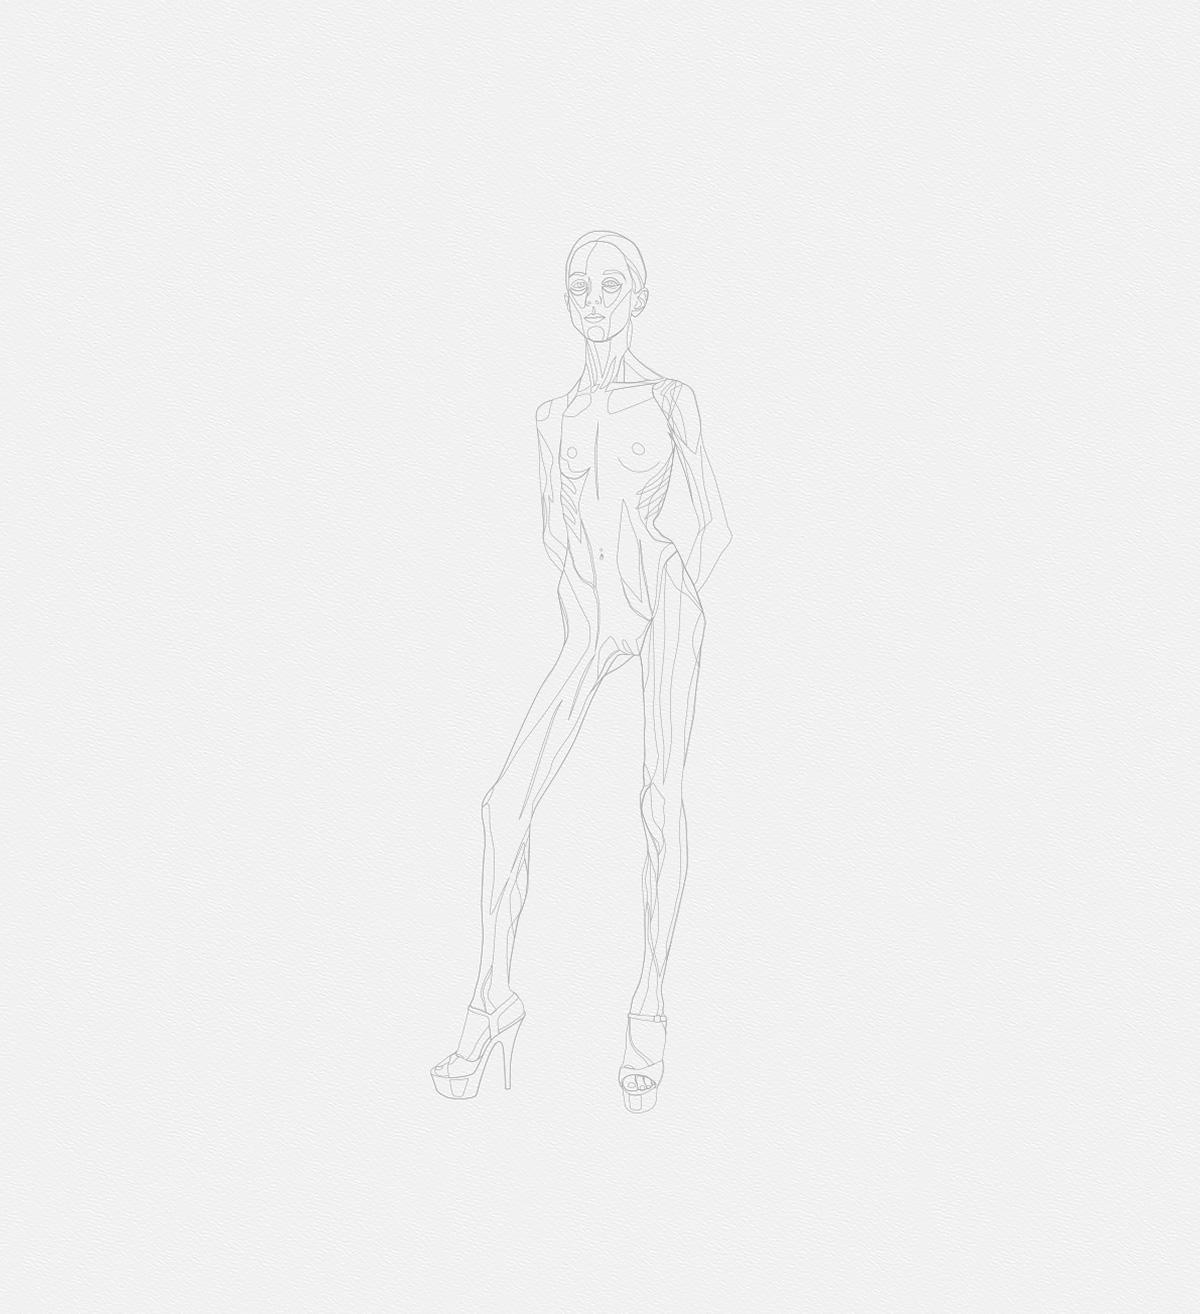 160 2016 la petite danseuse drawbot 002 resume high tty art - Resume - High Definition